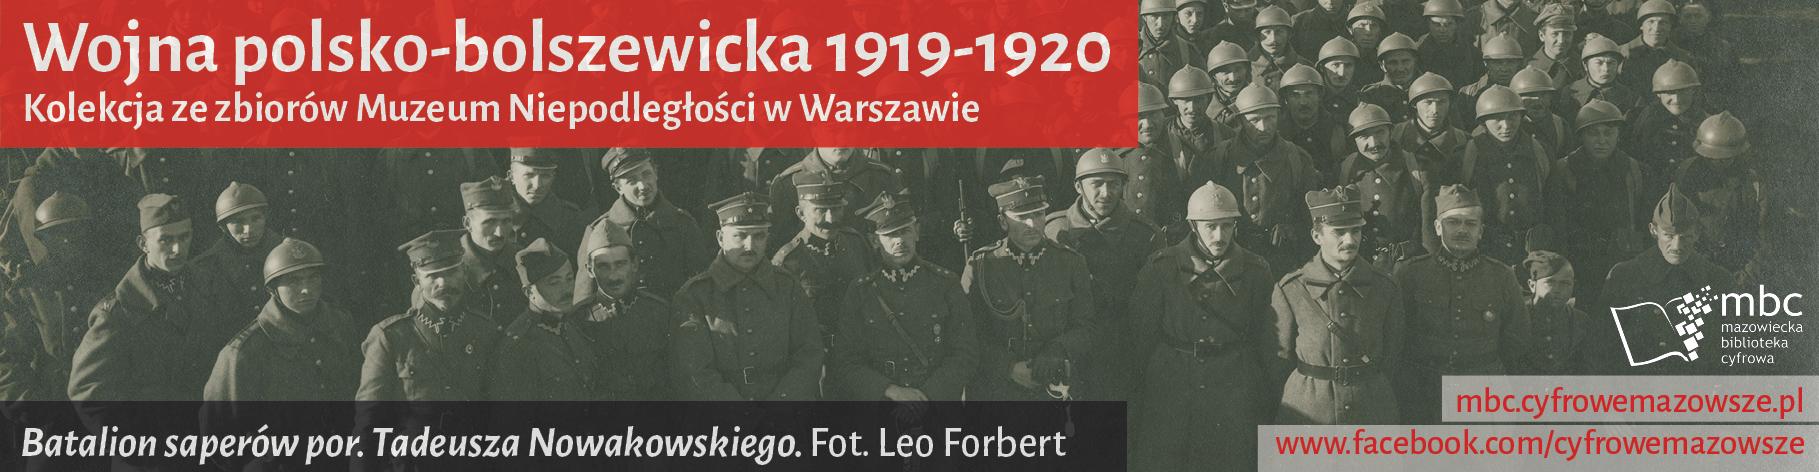 2020-08-10_Wojna_polsko-bolszewicka_1919-1920-770-x200-v2.jpg